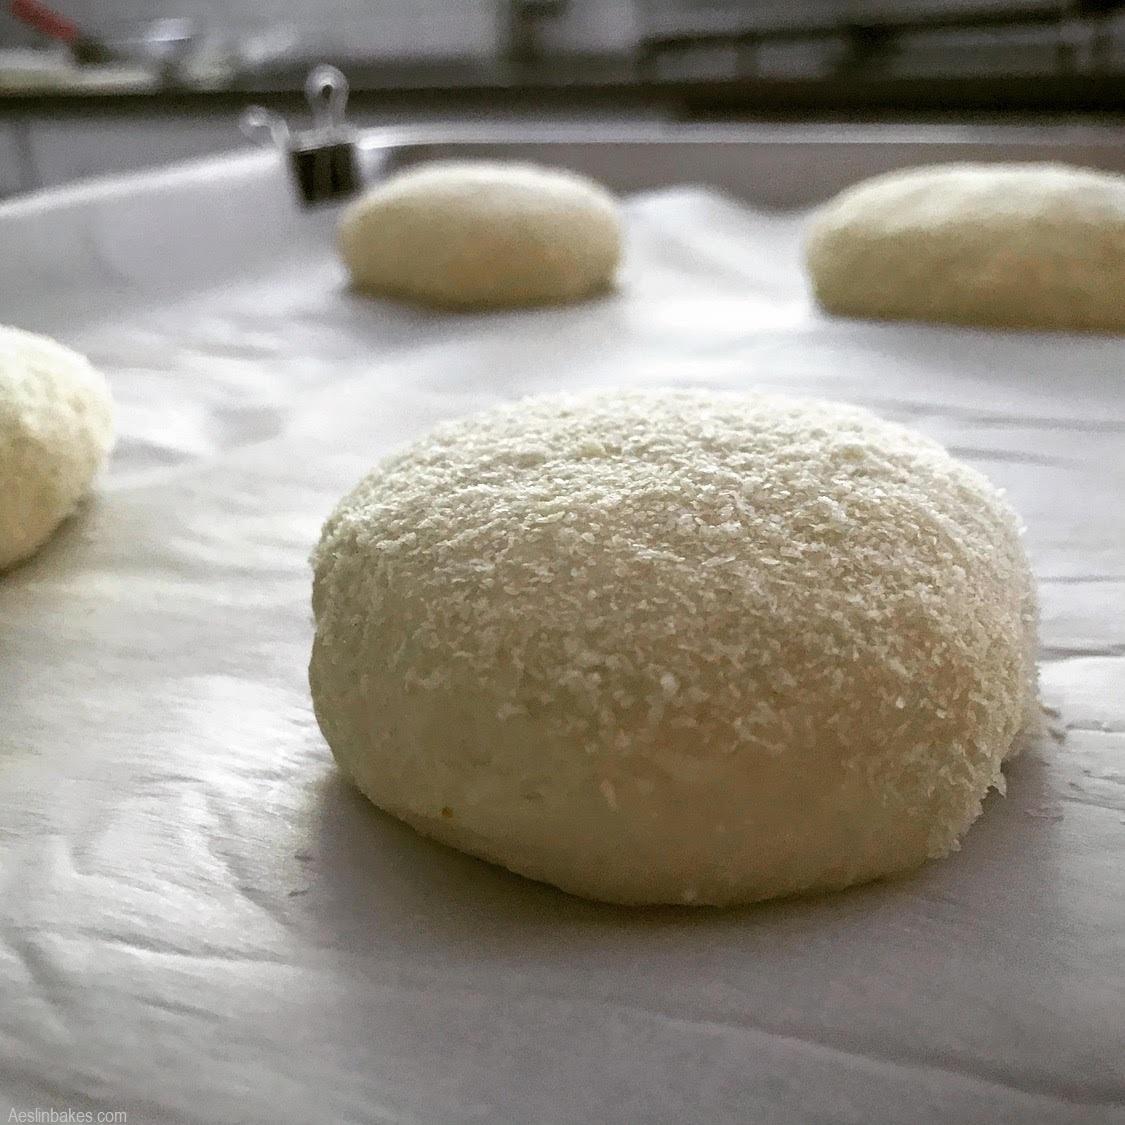 hamburger buns flattened